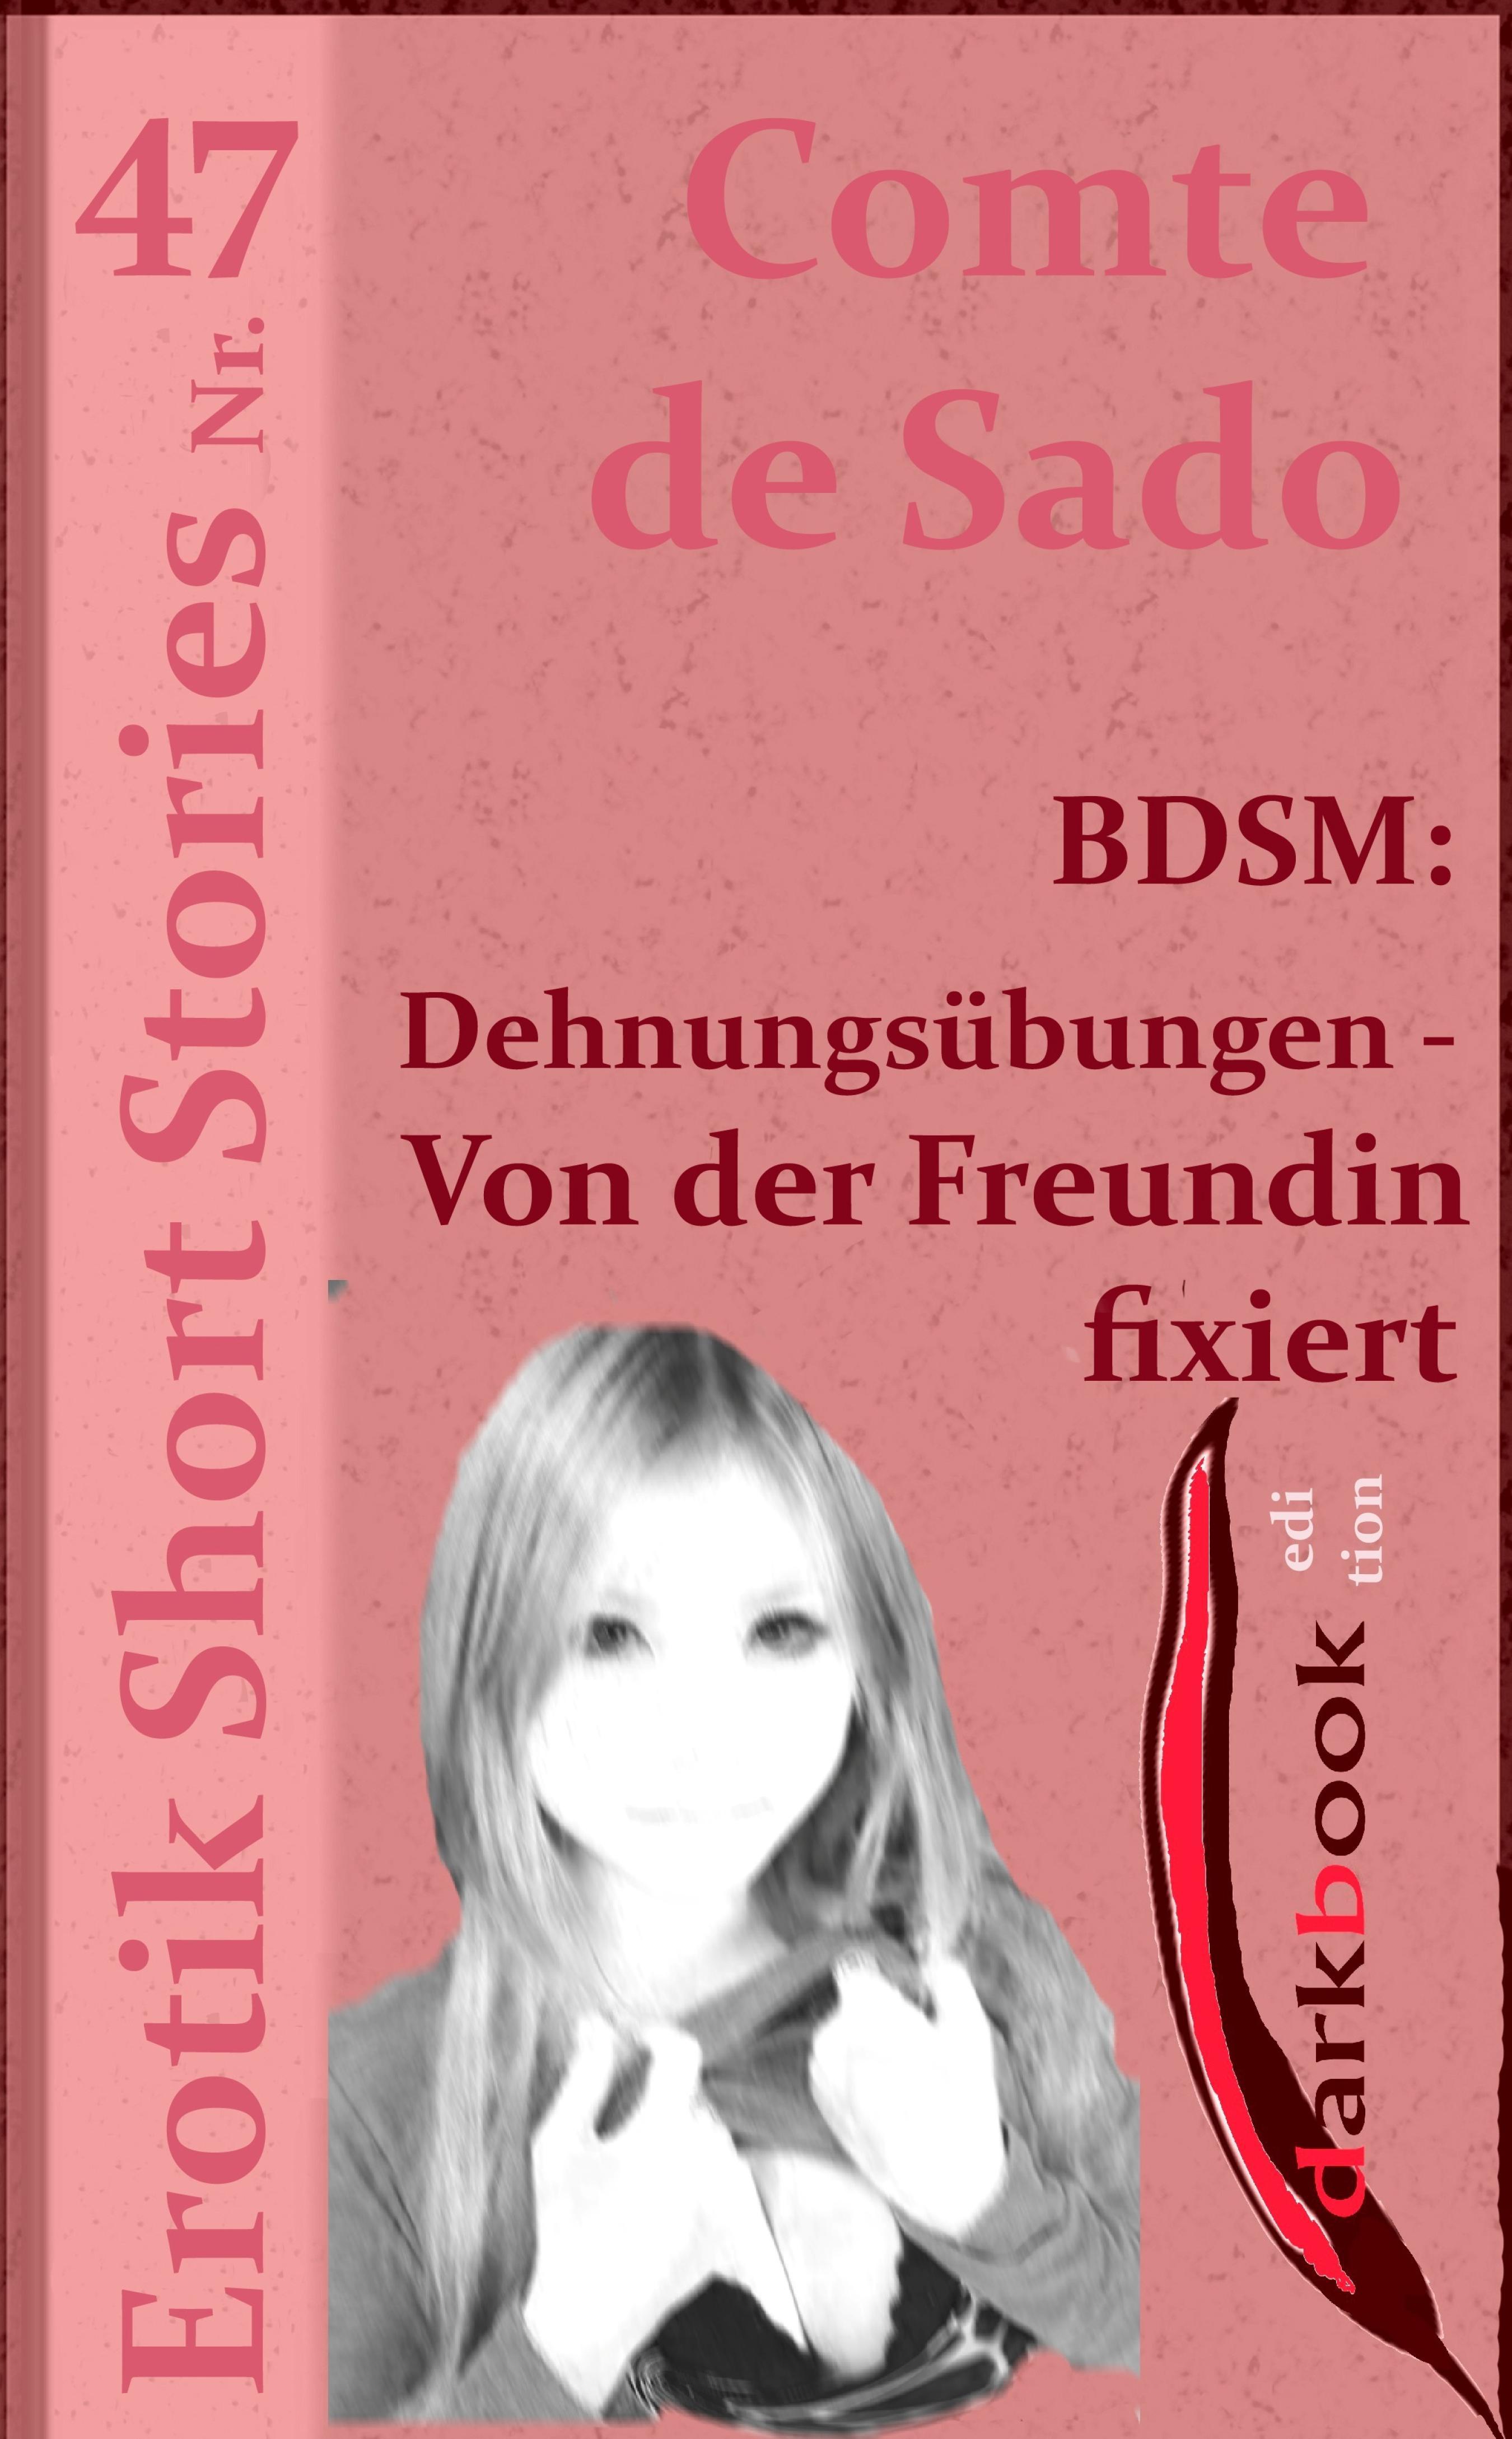 Comte de Sado BDSM: Dehnungsübungen - Von der Freundin fixiert comte de sado bdsm rosi weiß was jünglinge brauchen